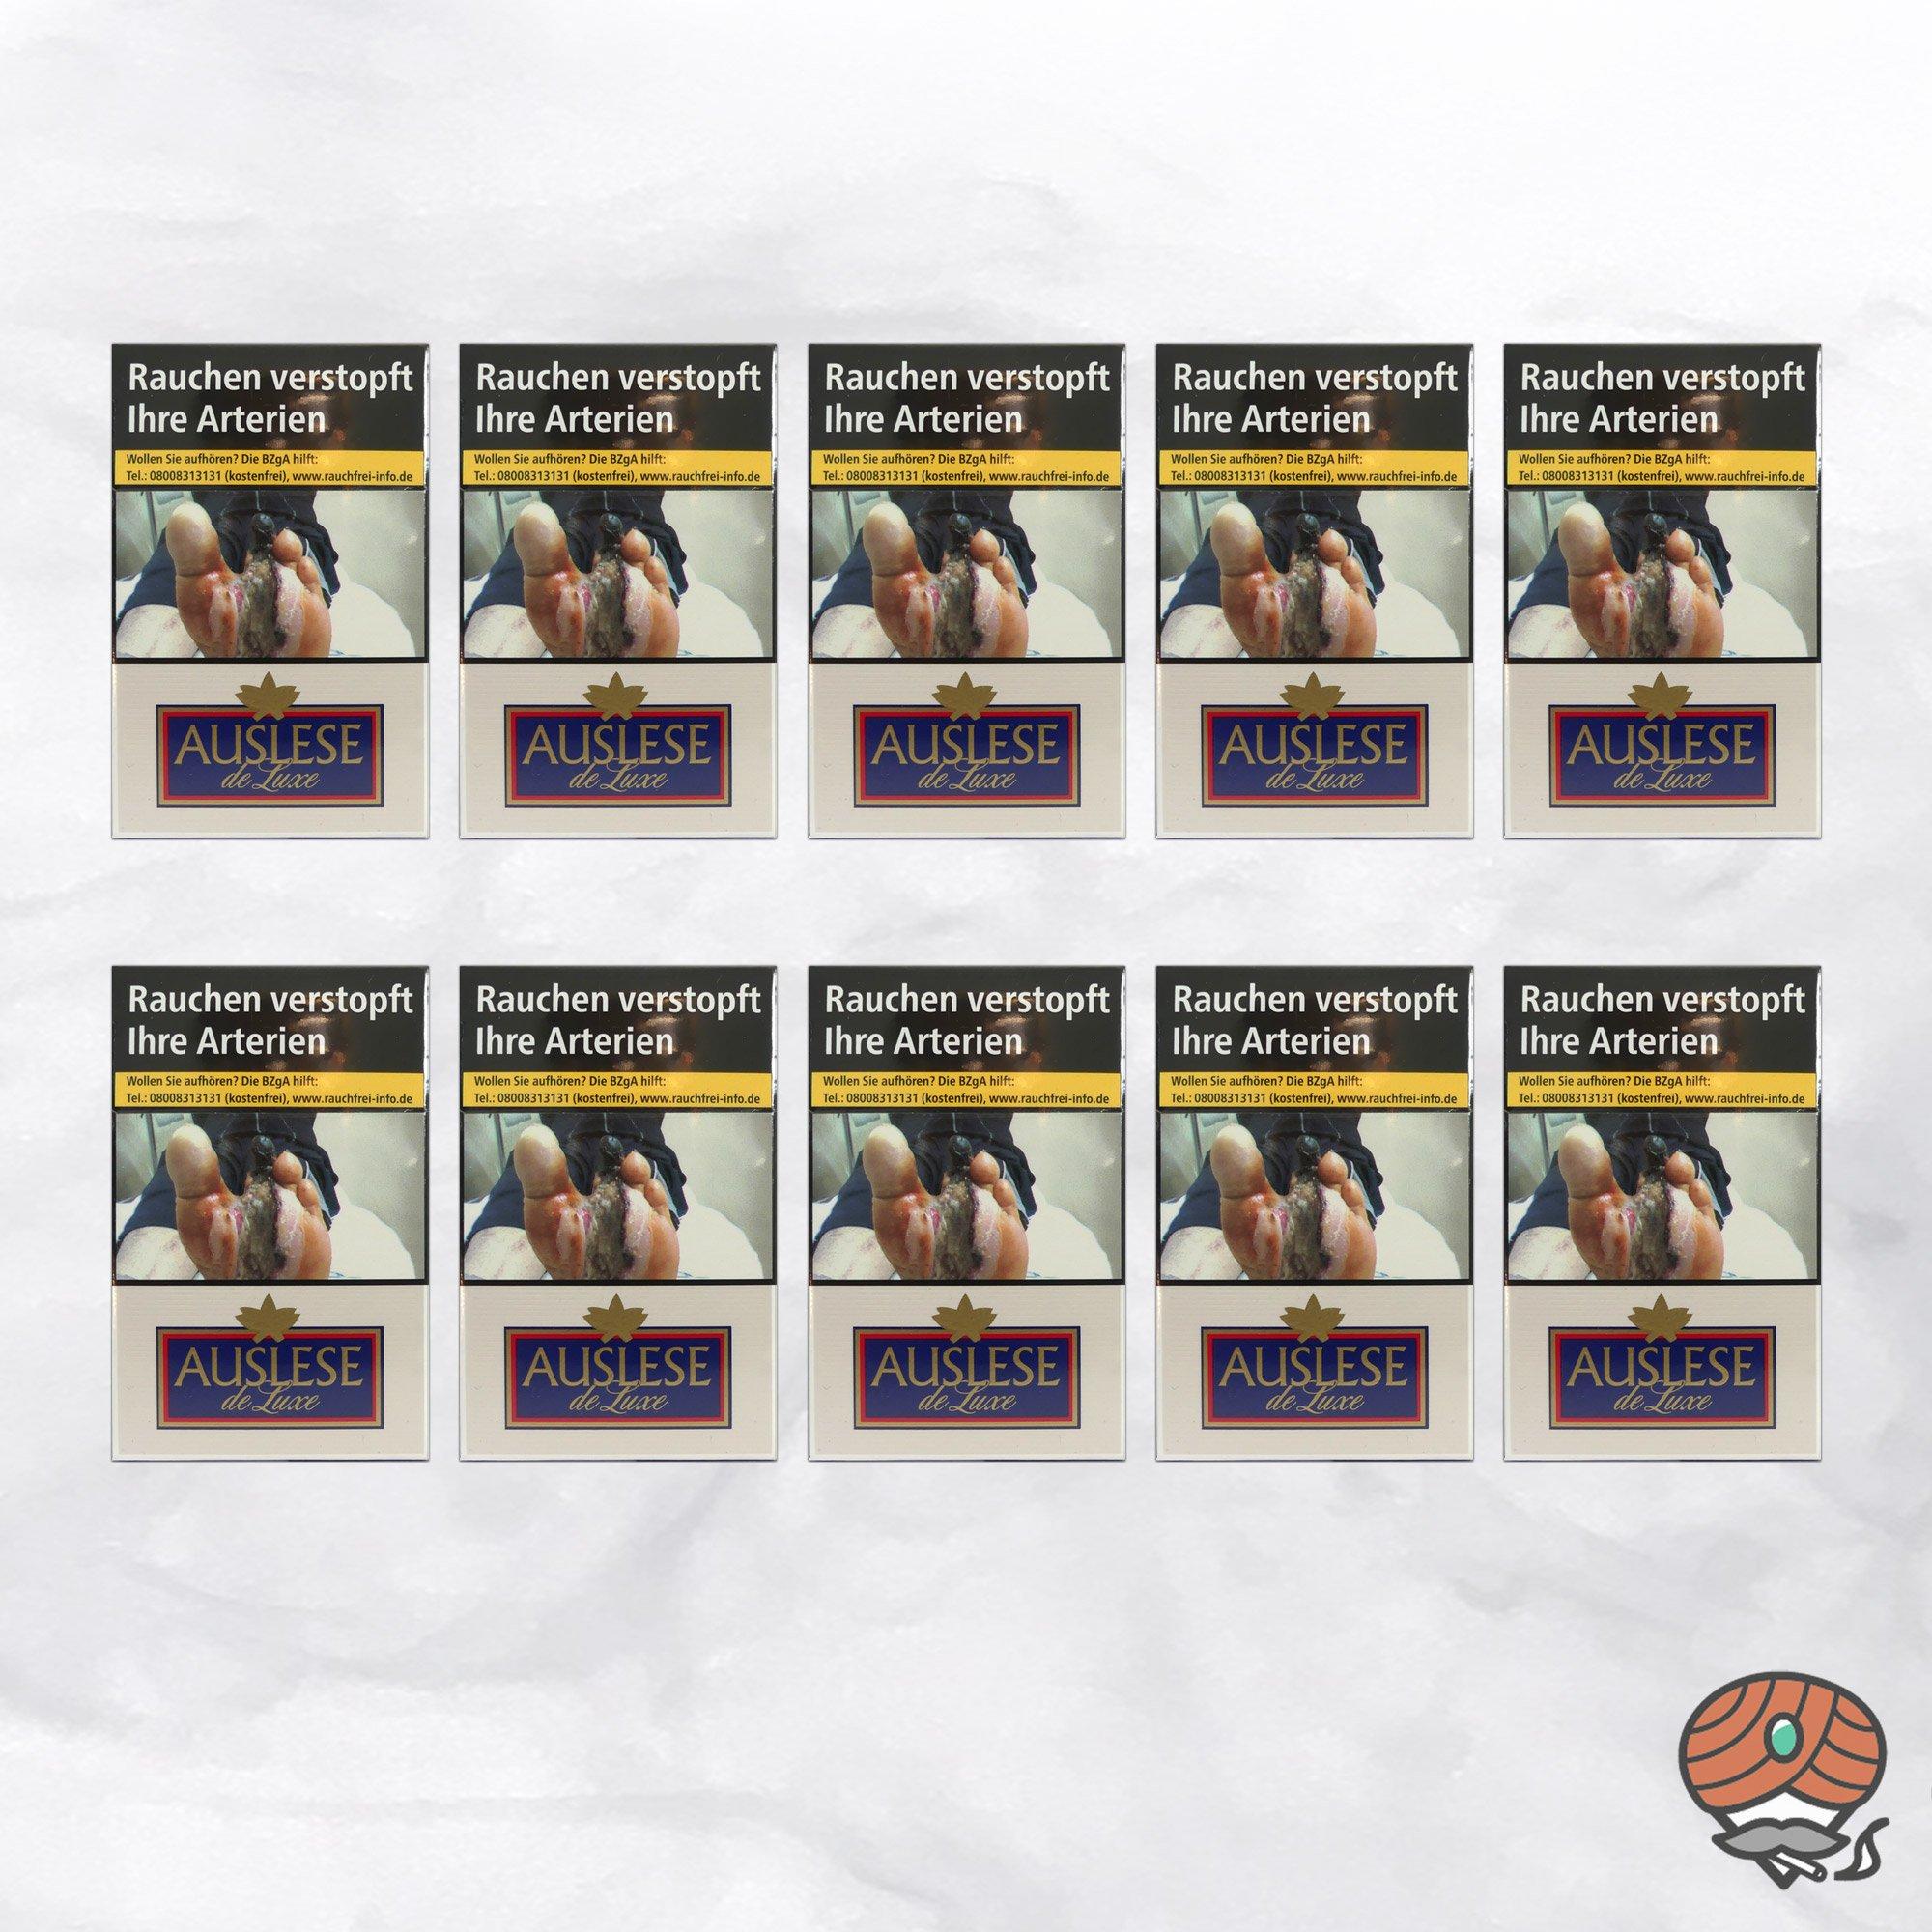 10 x AUSLESE de Luxe Filterzigaretten - 1 Stange mit 10 x 20 Zigaretten